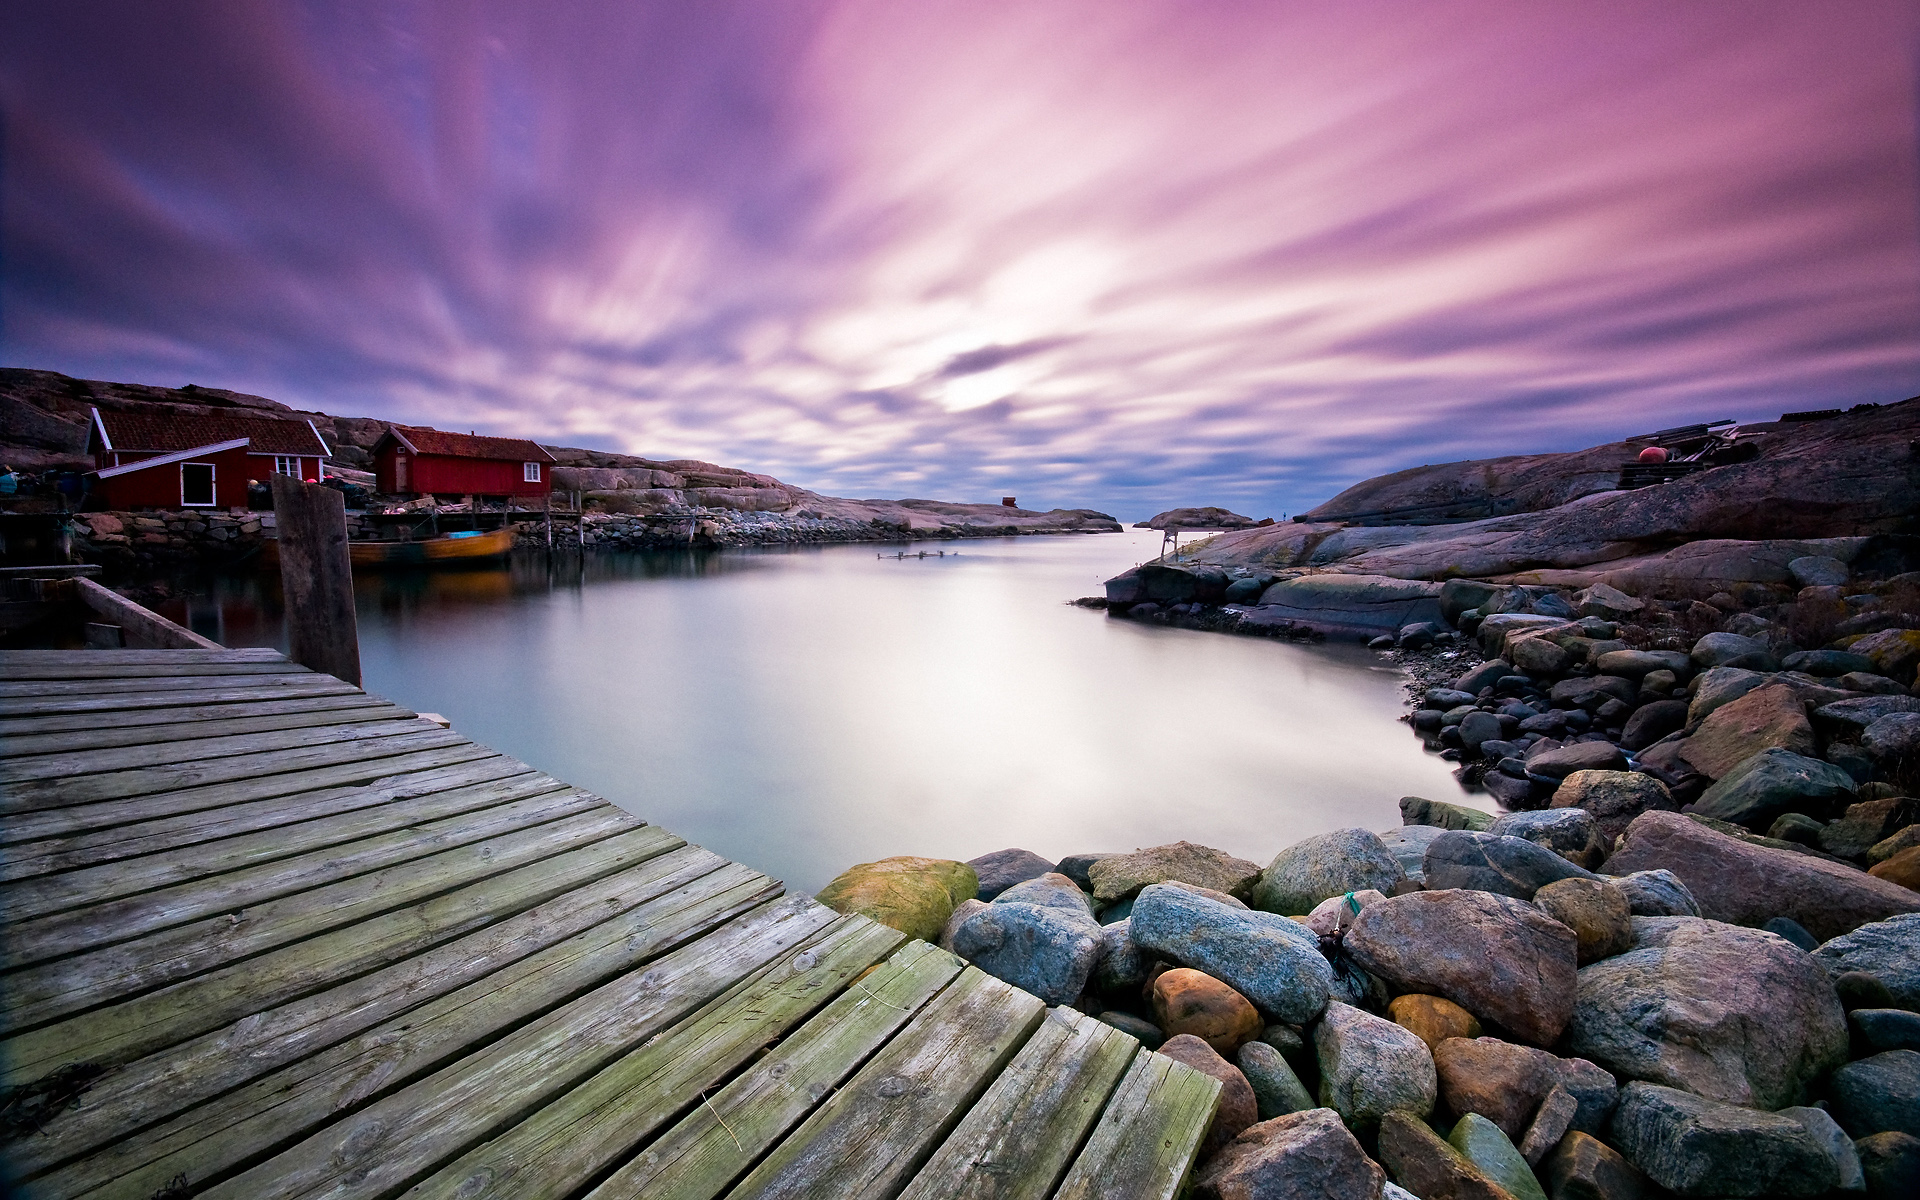 HD Wallpapers Swedish West Coast